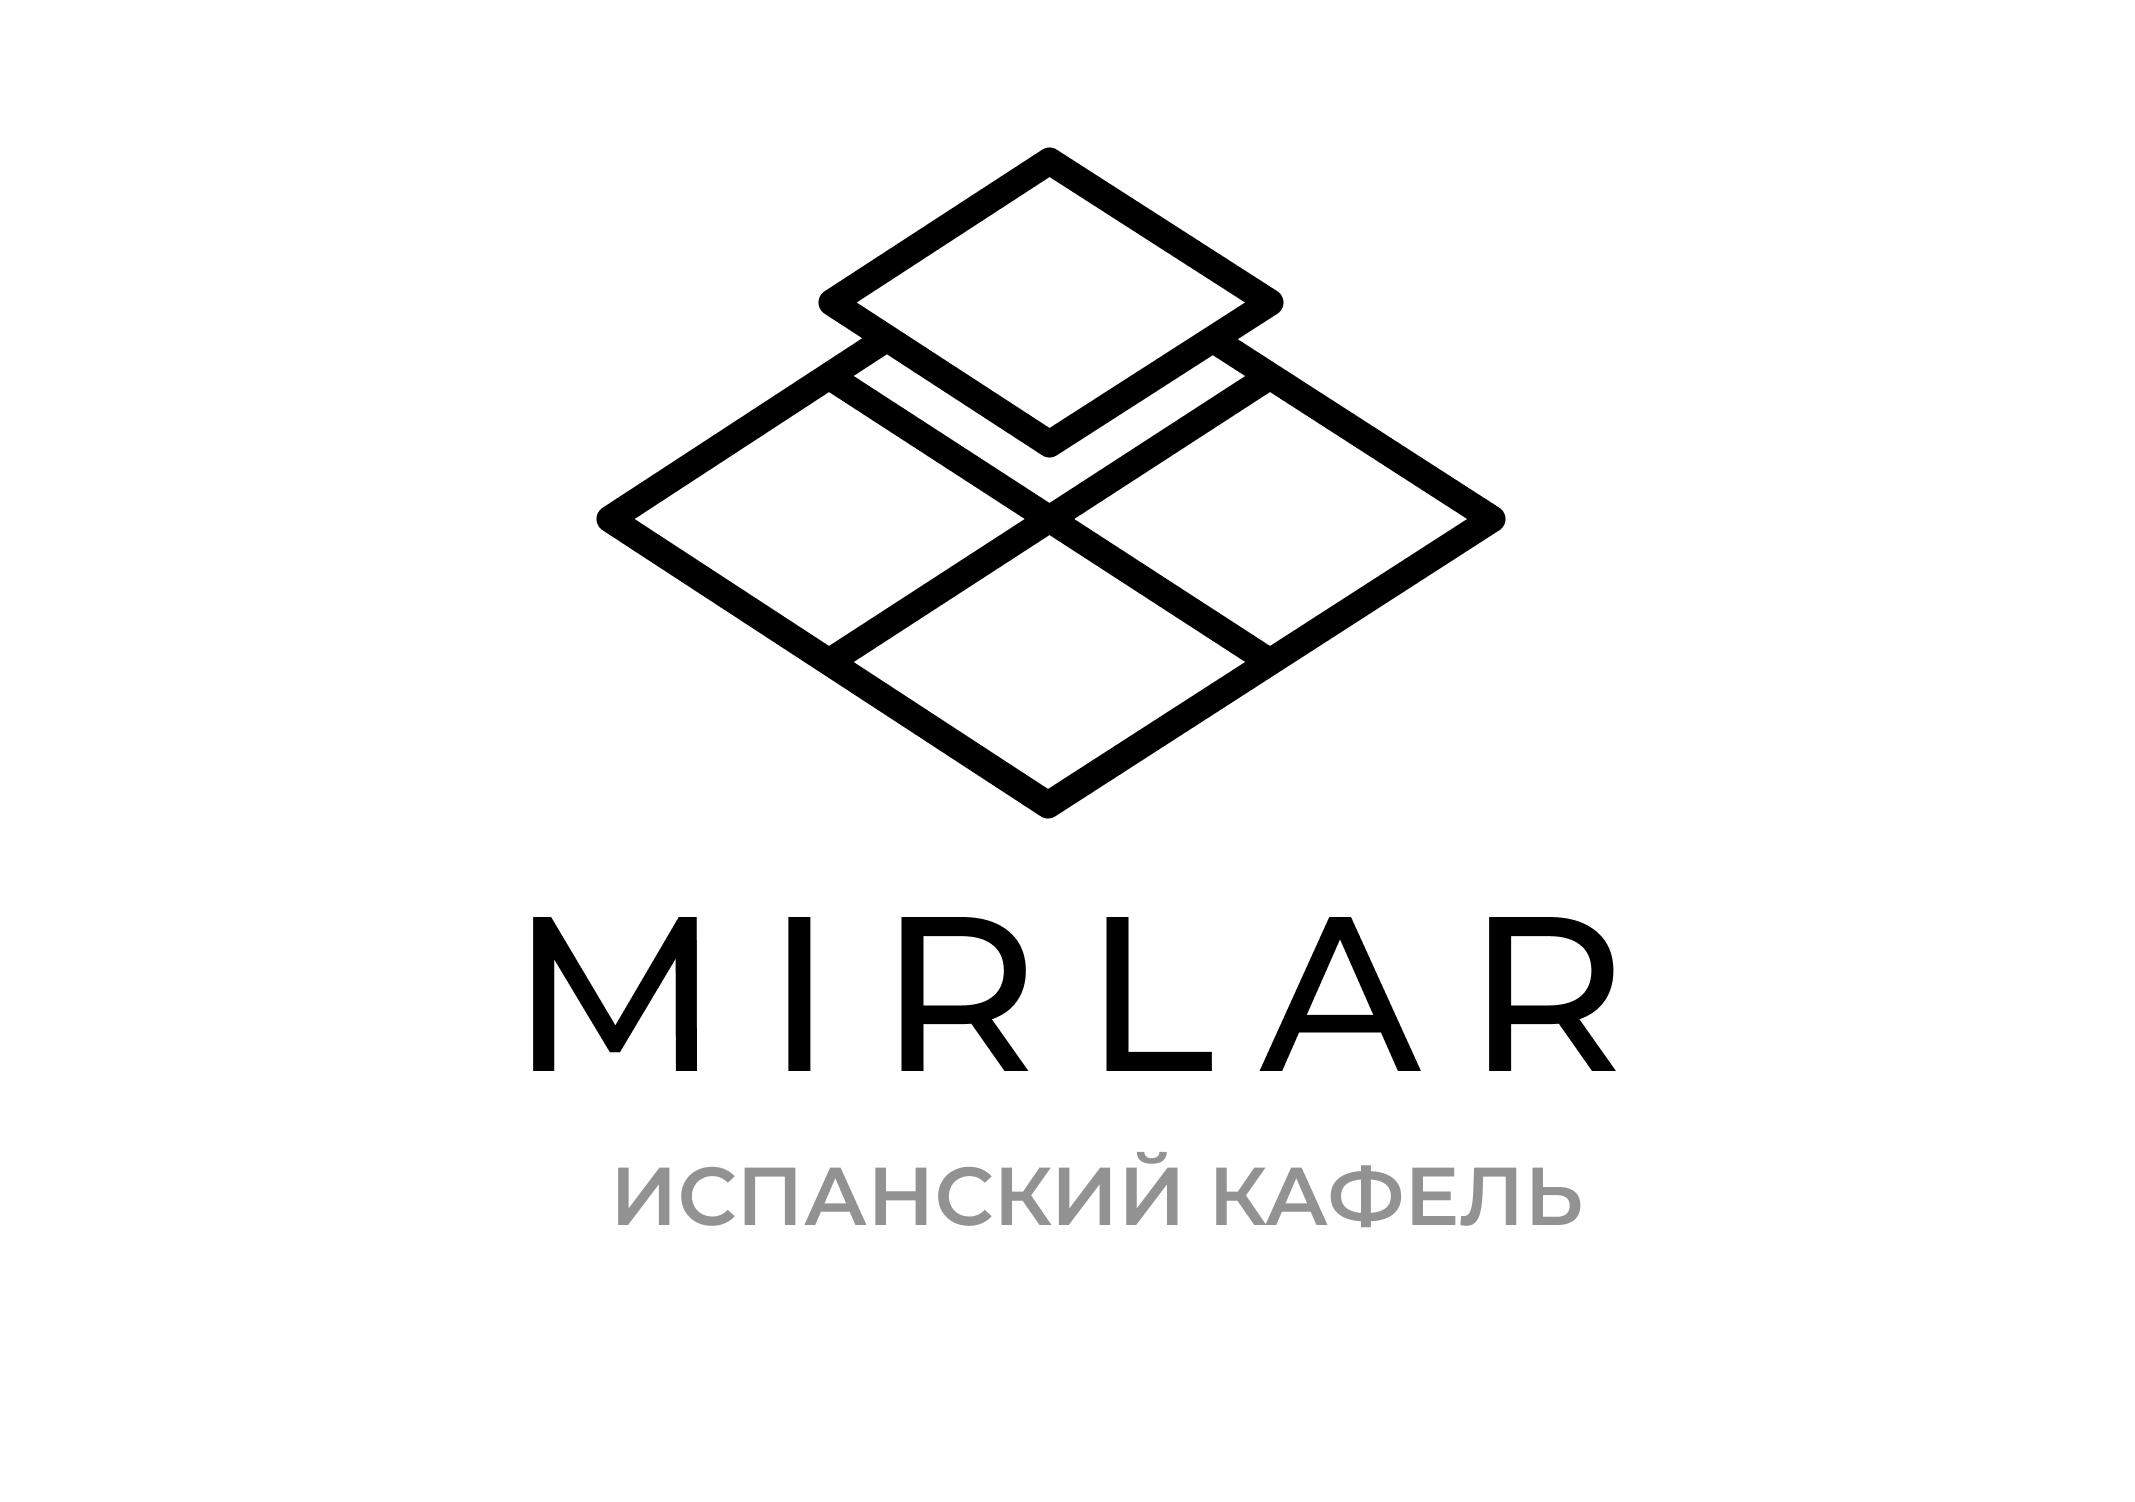 Mirlar – Испанский кафель